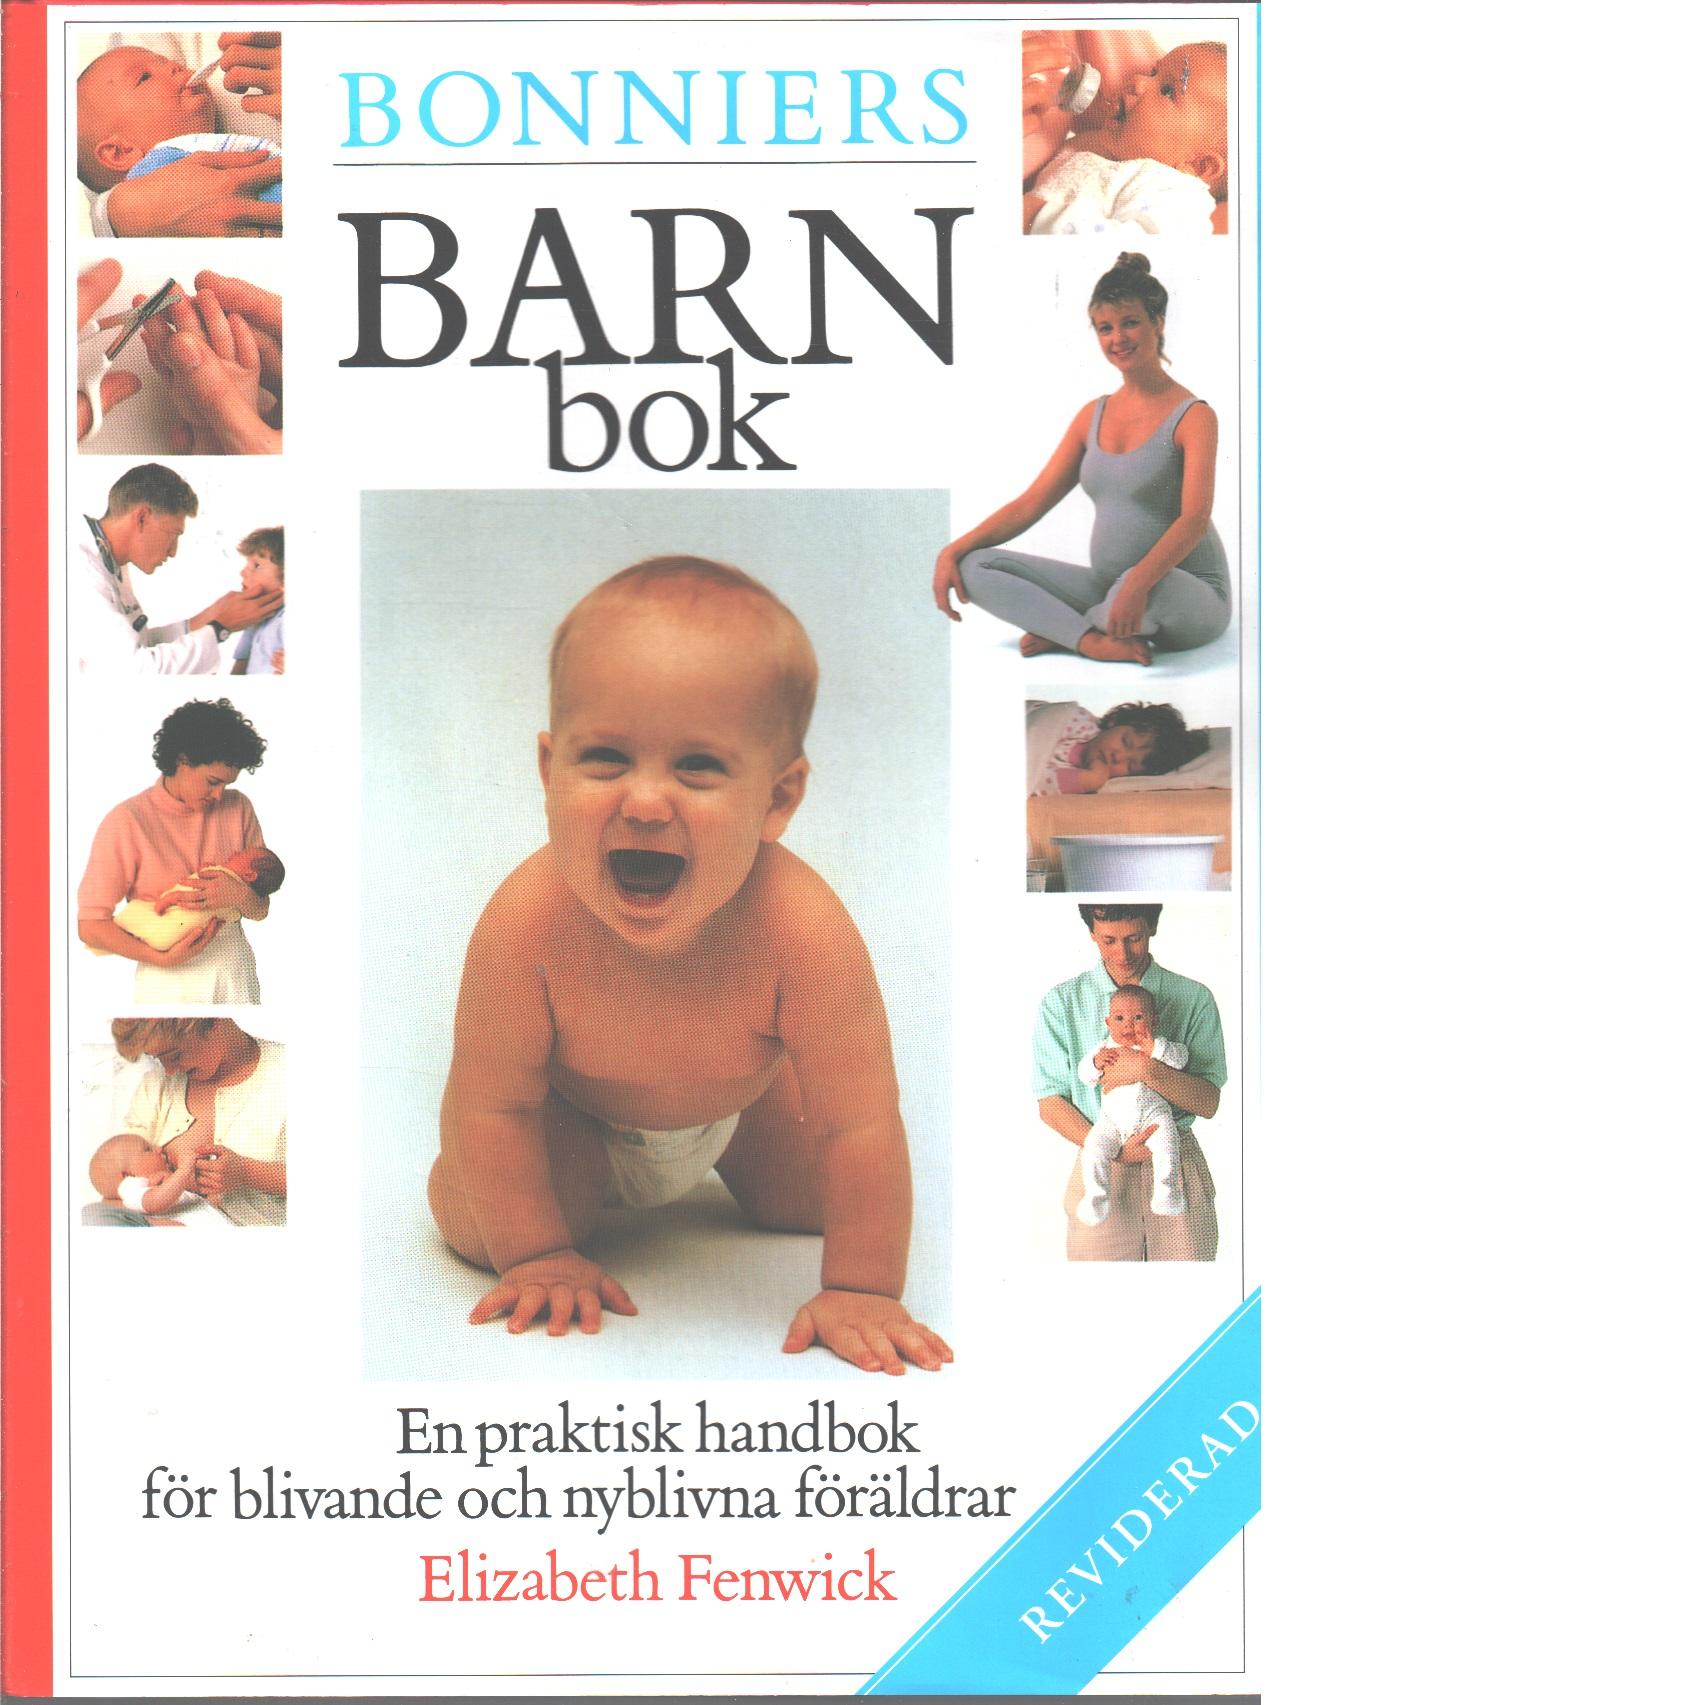 Bonniers barnbok - Fenwick, Elizabeth